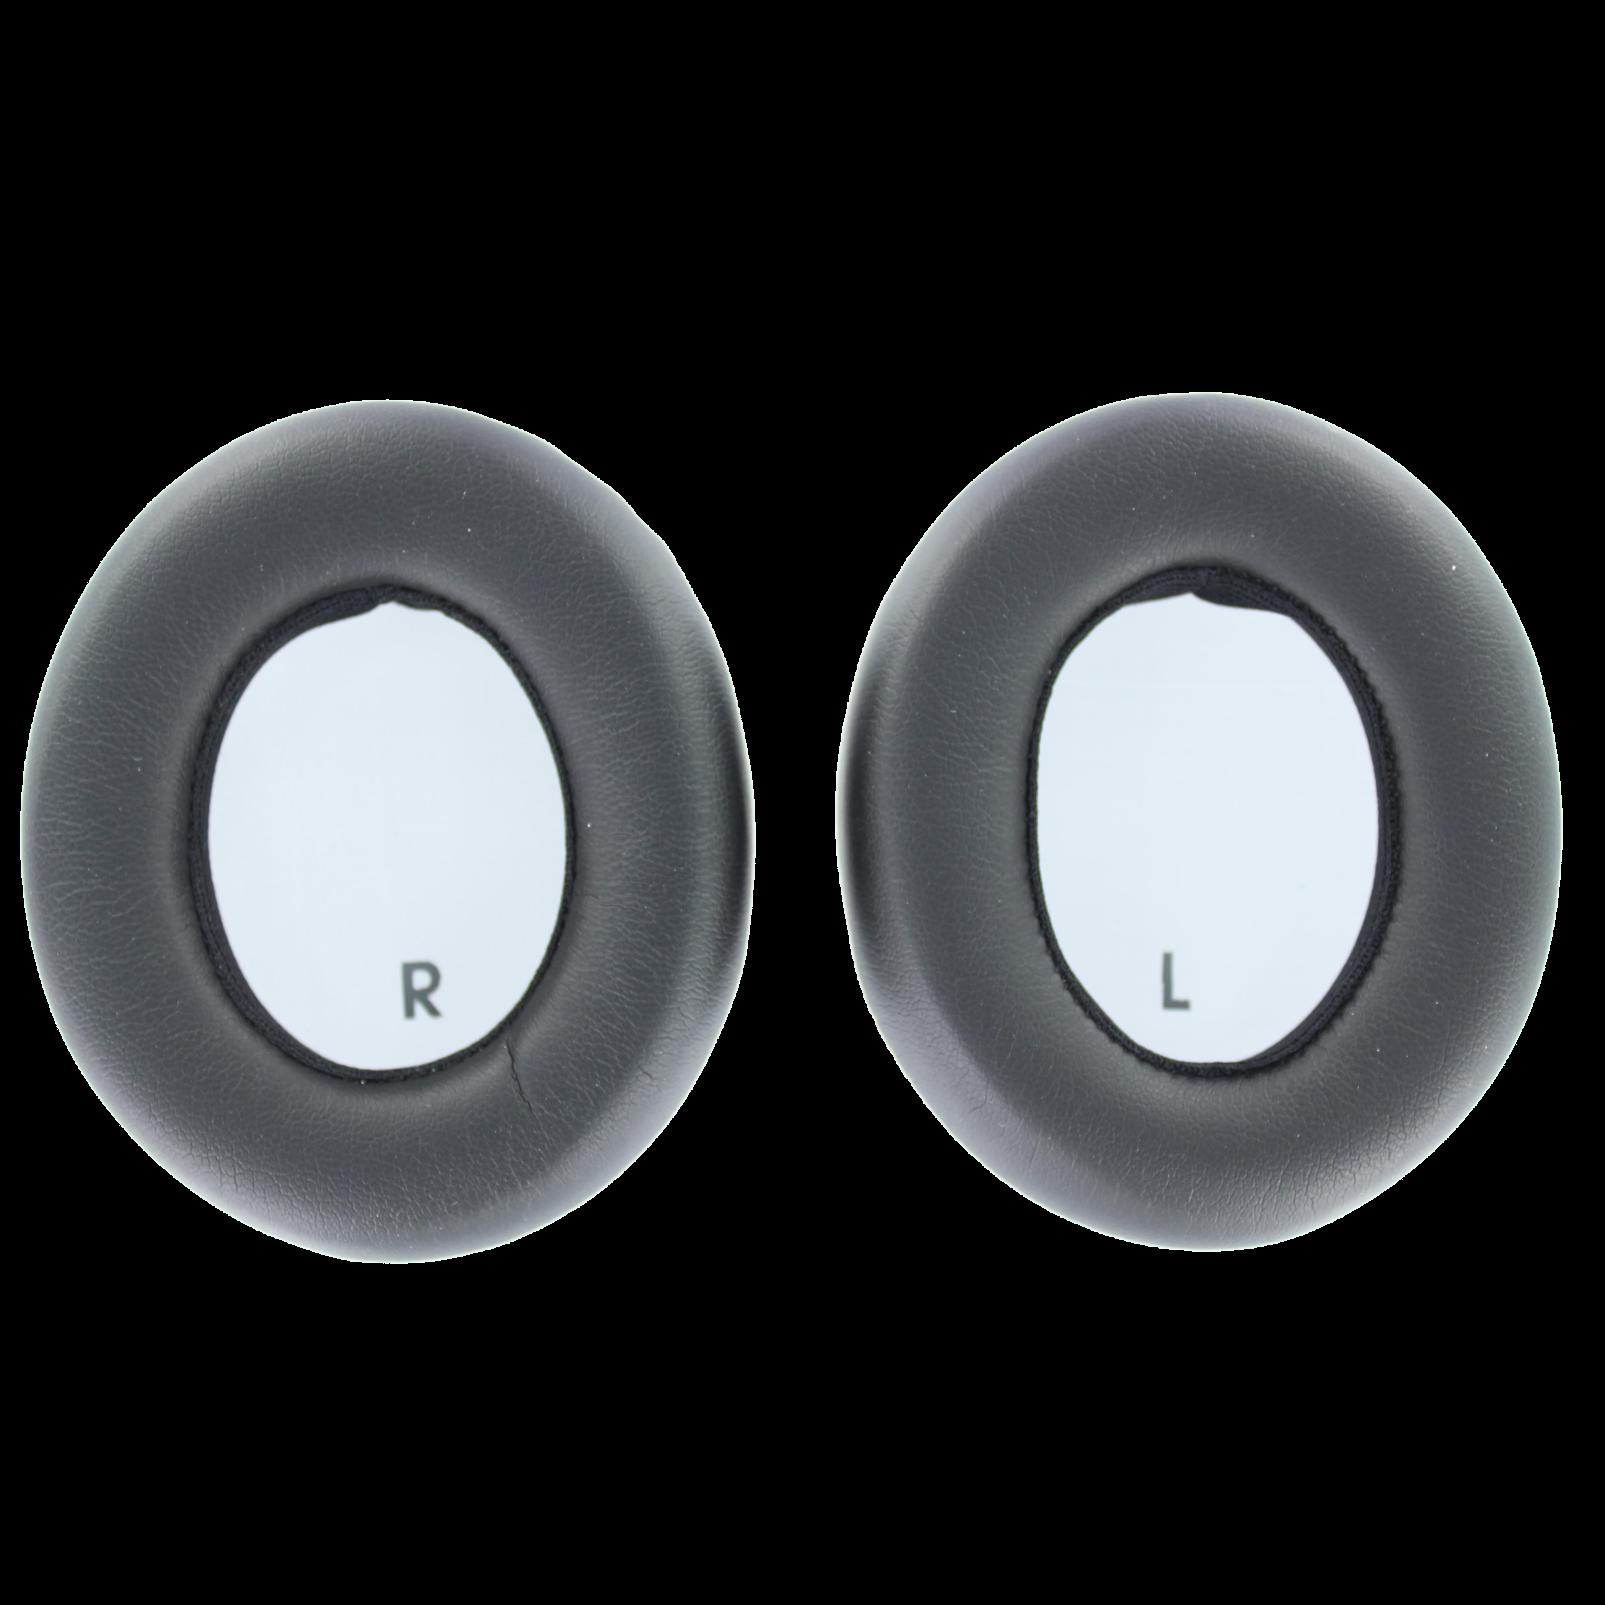 JBL Ear pads for Club 950 - Black - Ear pads - Hero